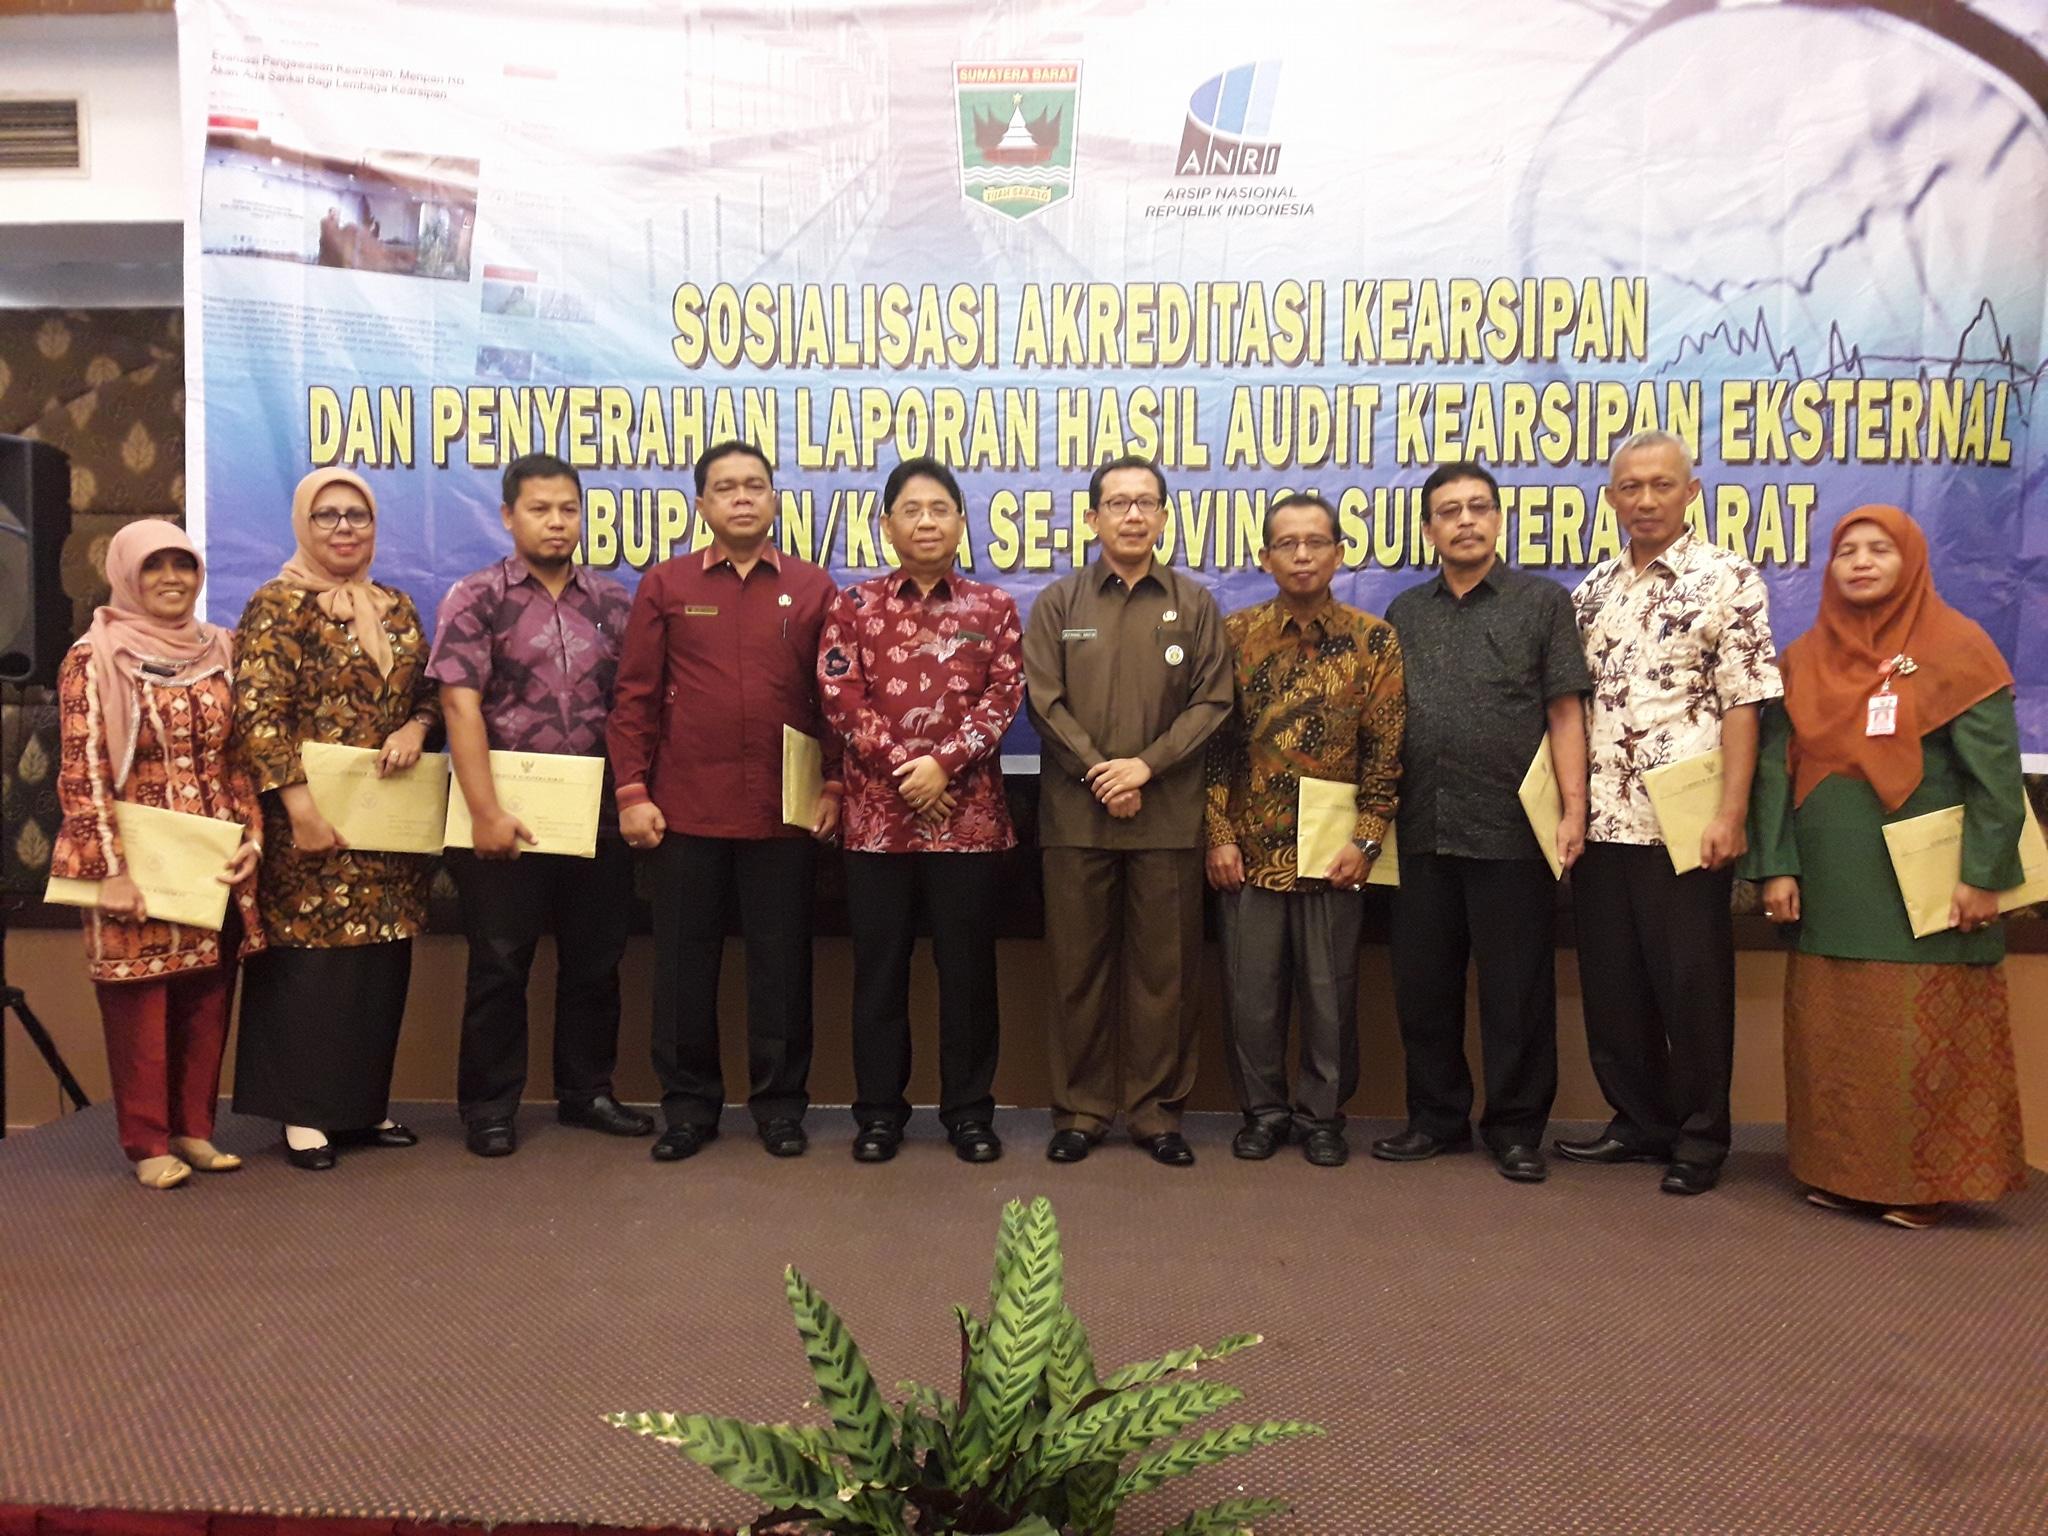 Laporan Audit Kearsipan 18 Kabupaten/Kota Buruk